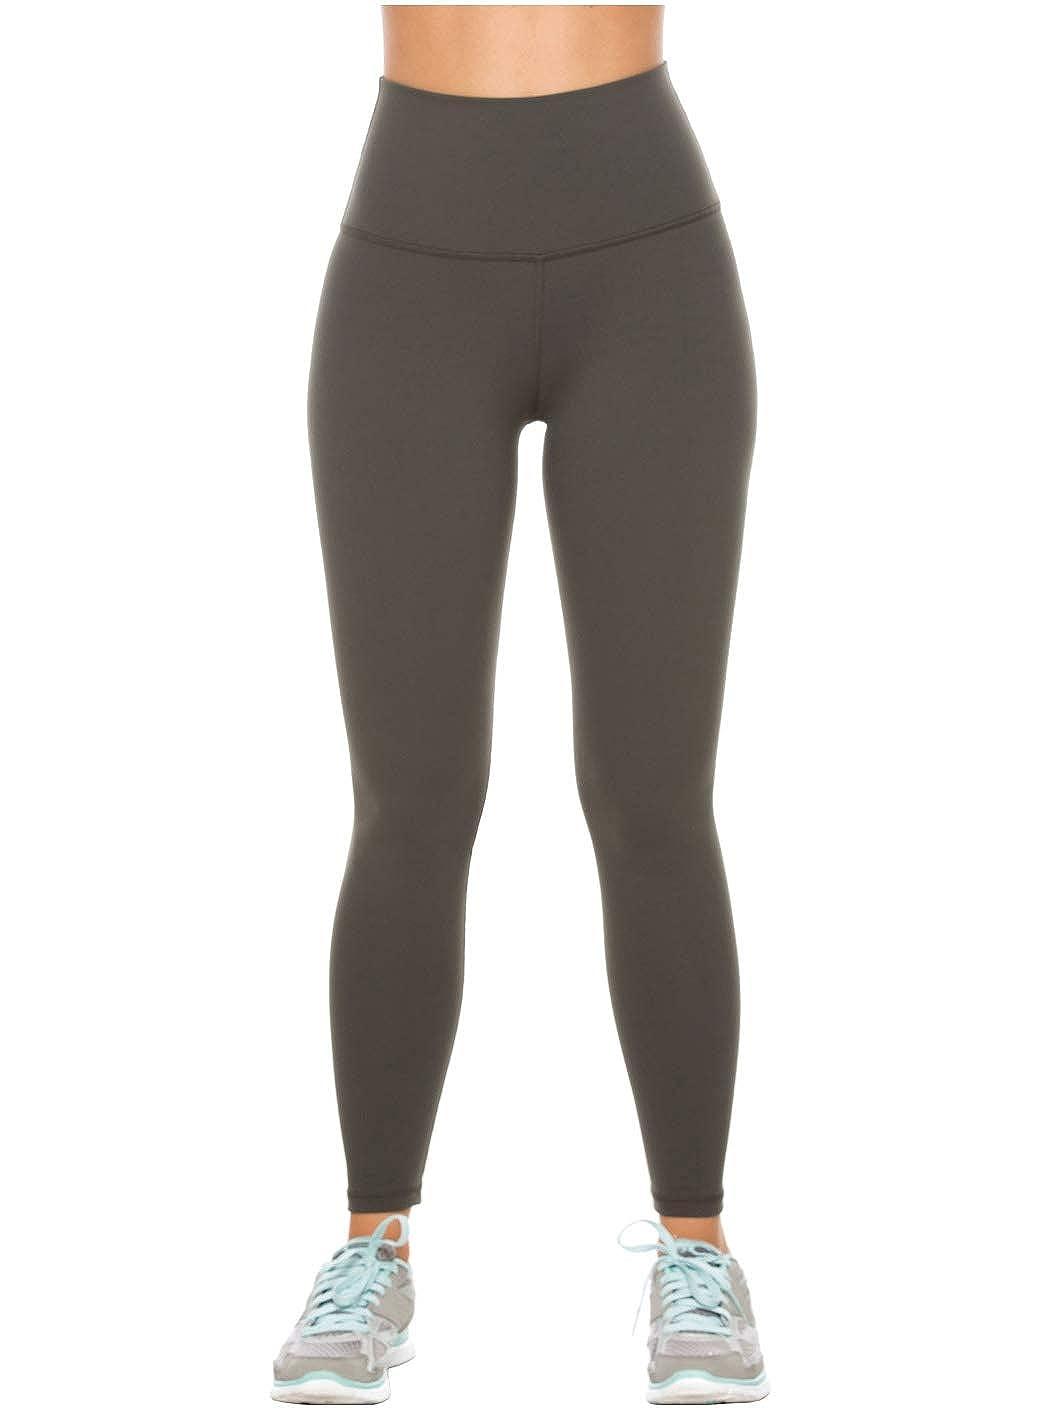 Amazon.com: Flexmee Leggings Sports Bra Ladies Activewear ...